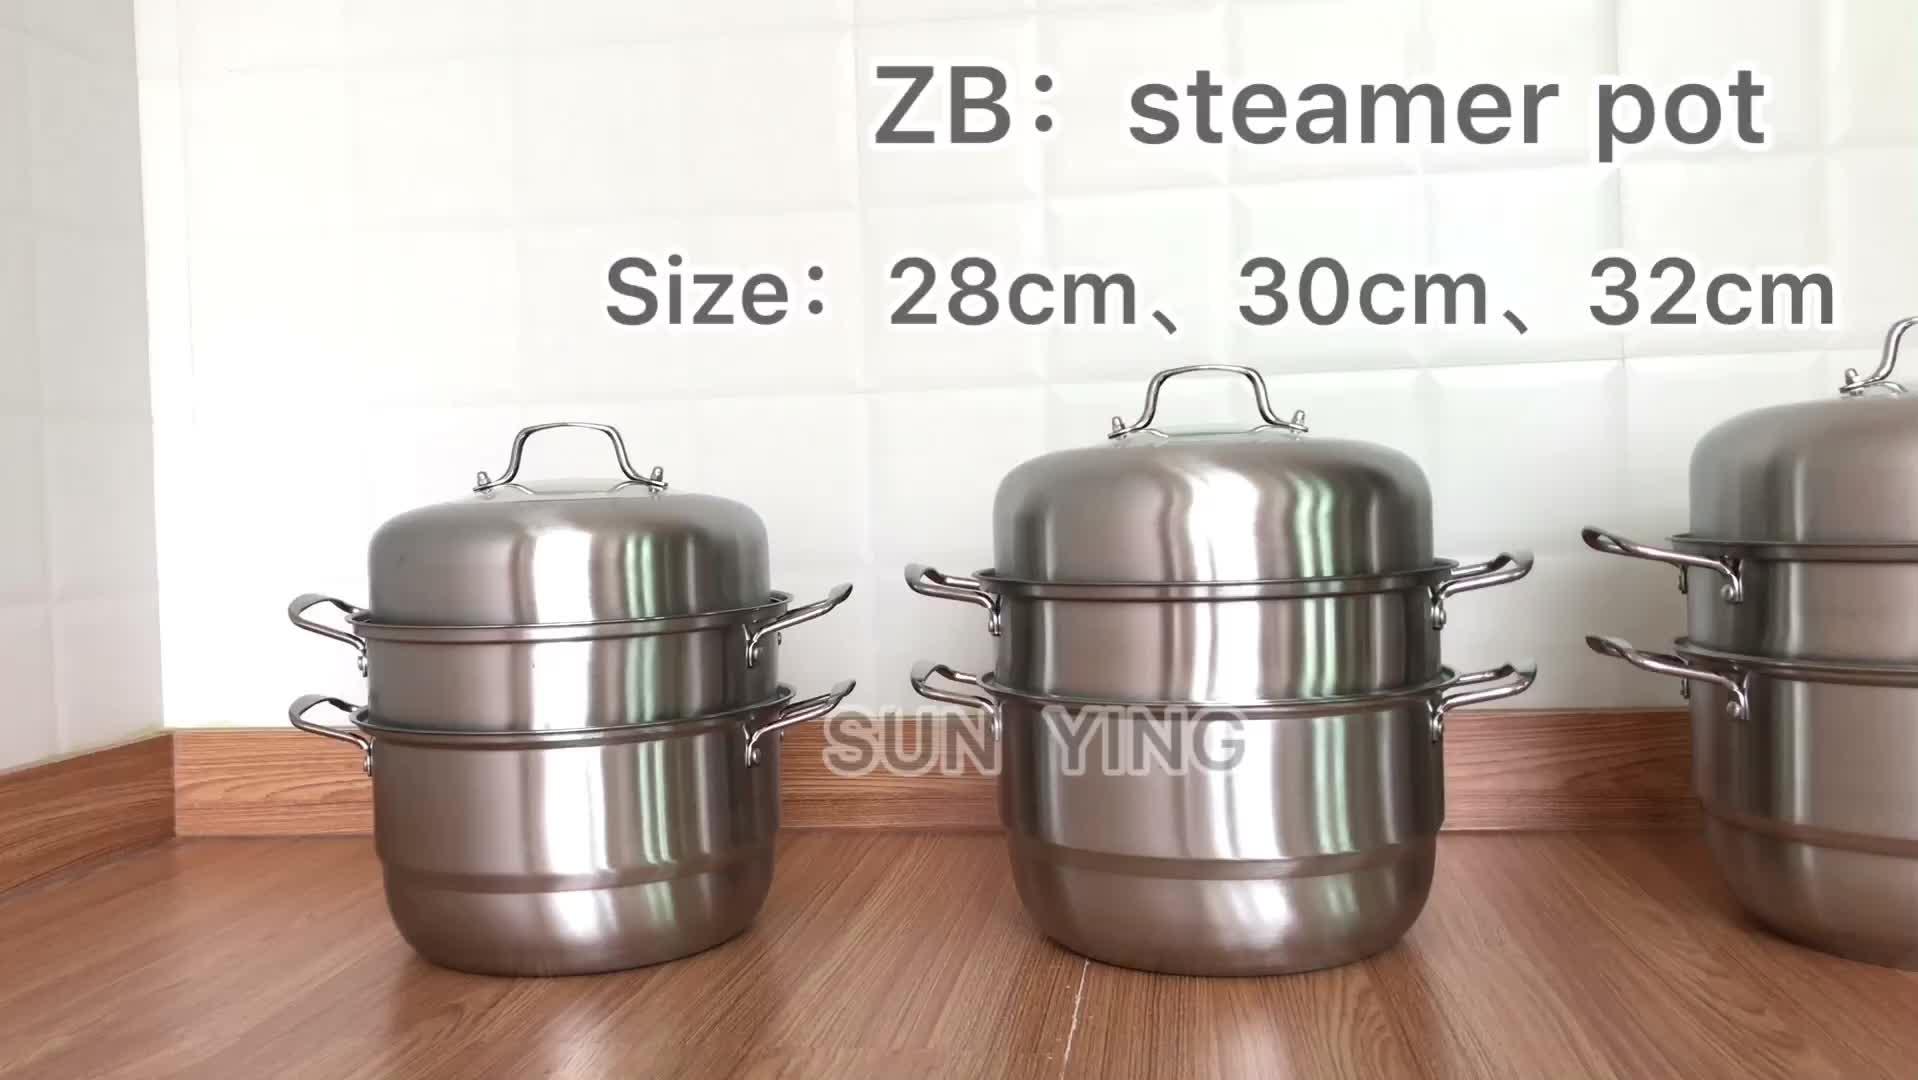 Edelstahl dampfer topf 28CM 2 oder 3 Schichten Lebensmittel Dampfer Kochtopf kochgeschirr sets kommerziellen dim sum dampfer mit Griffe